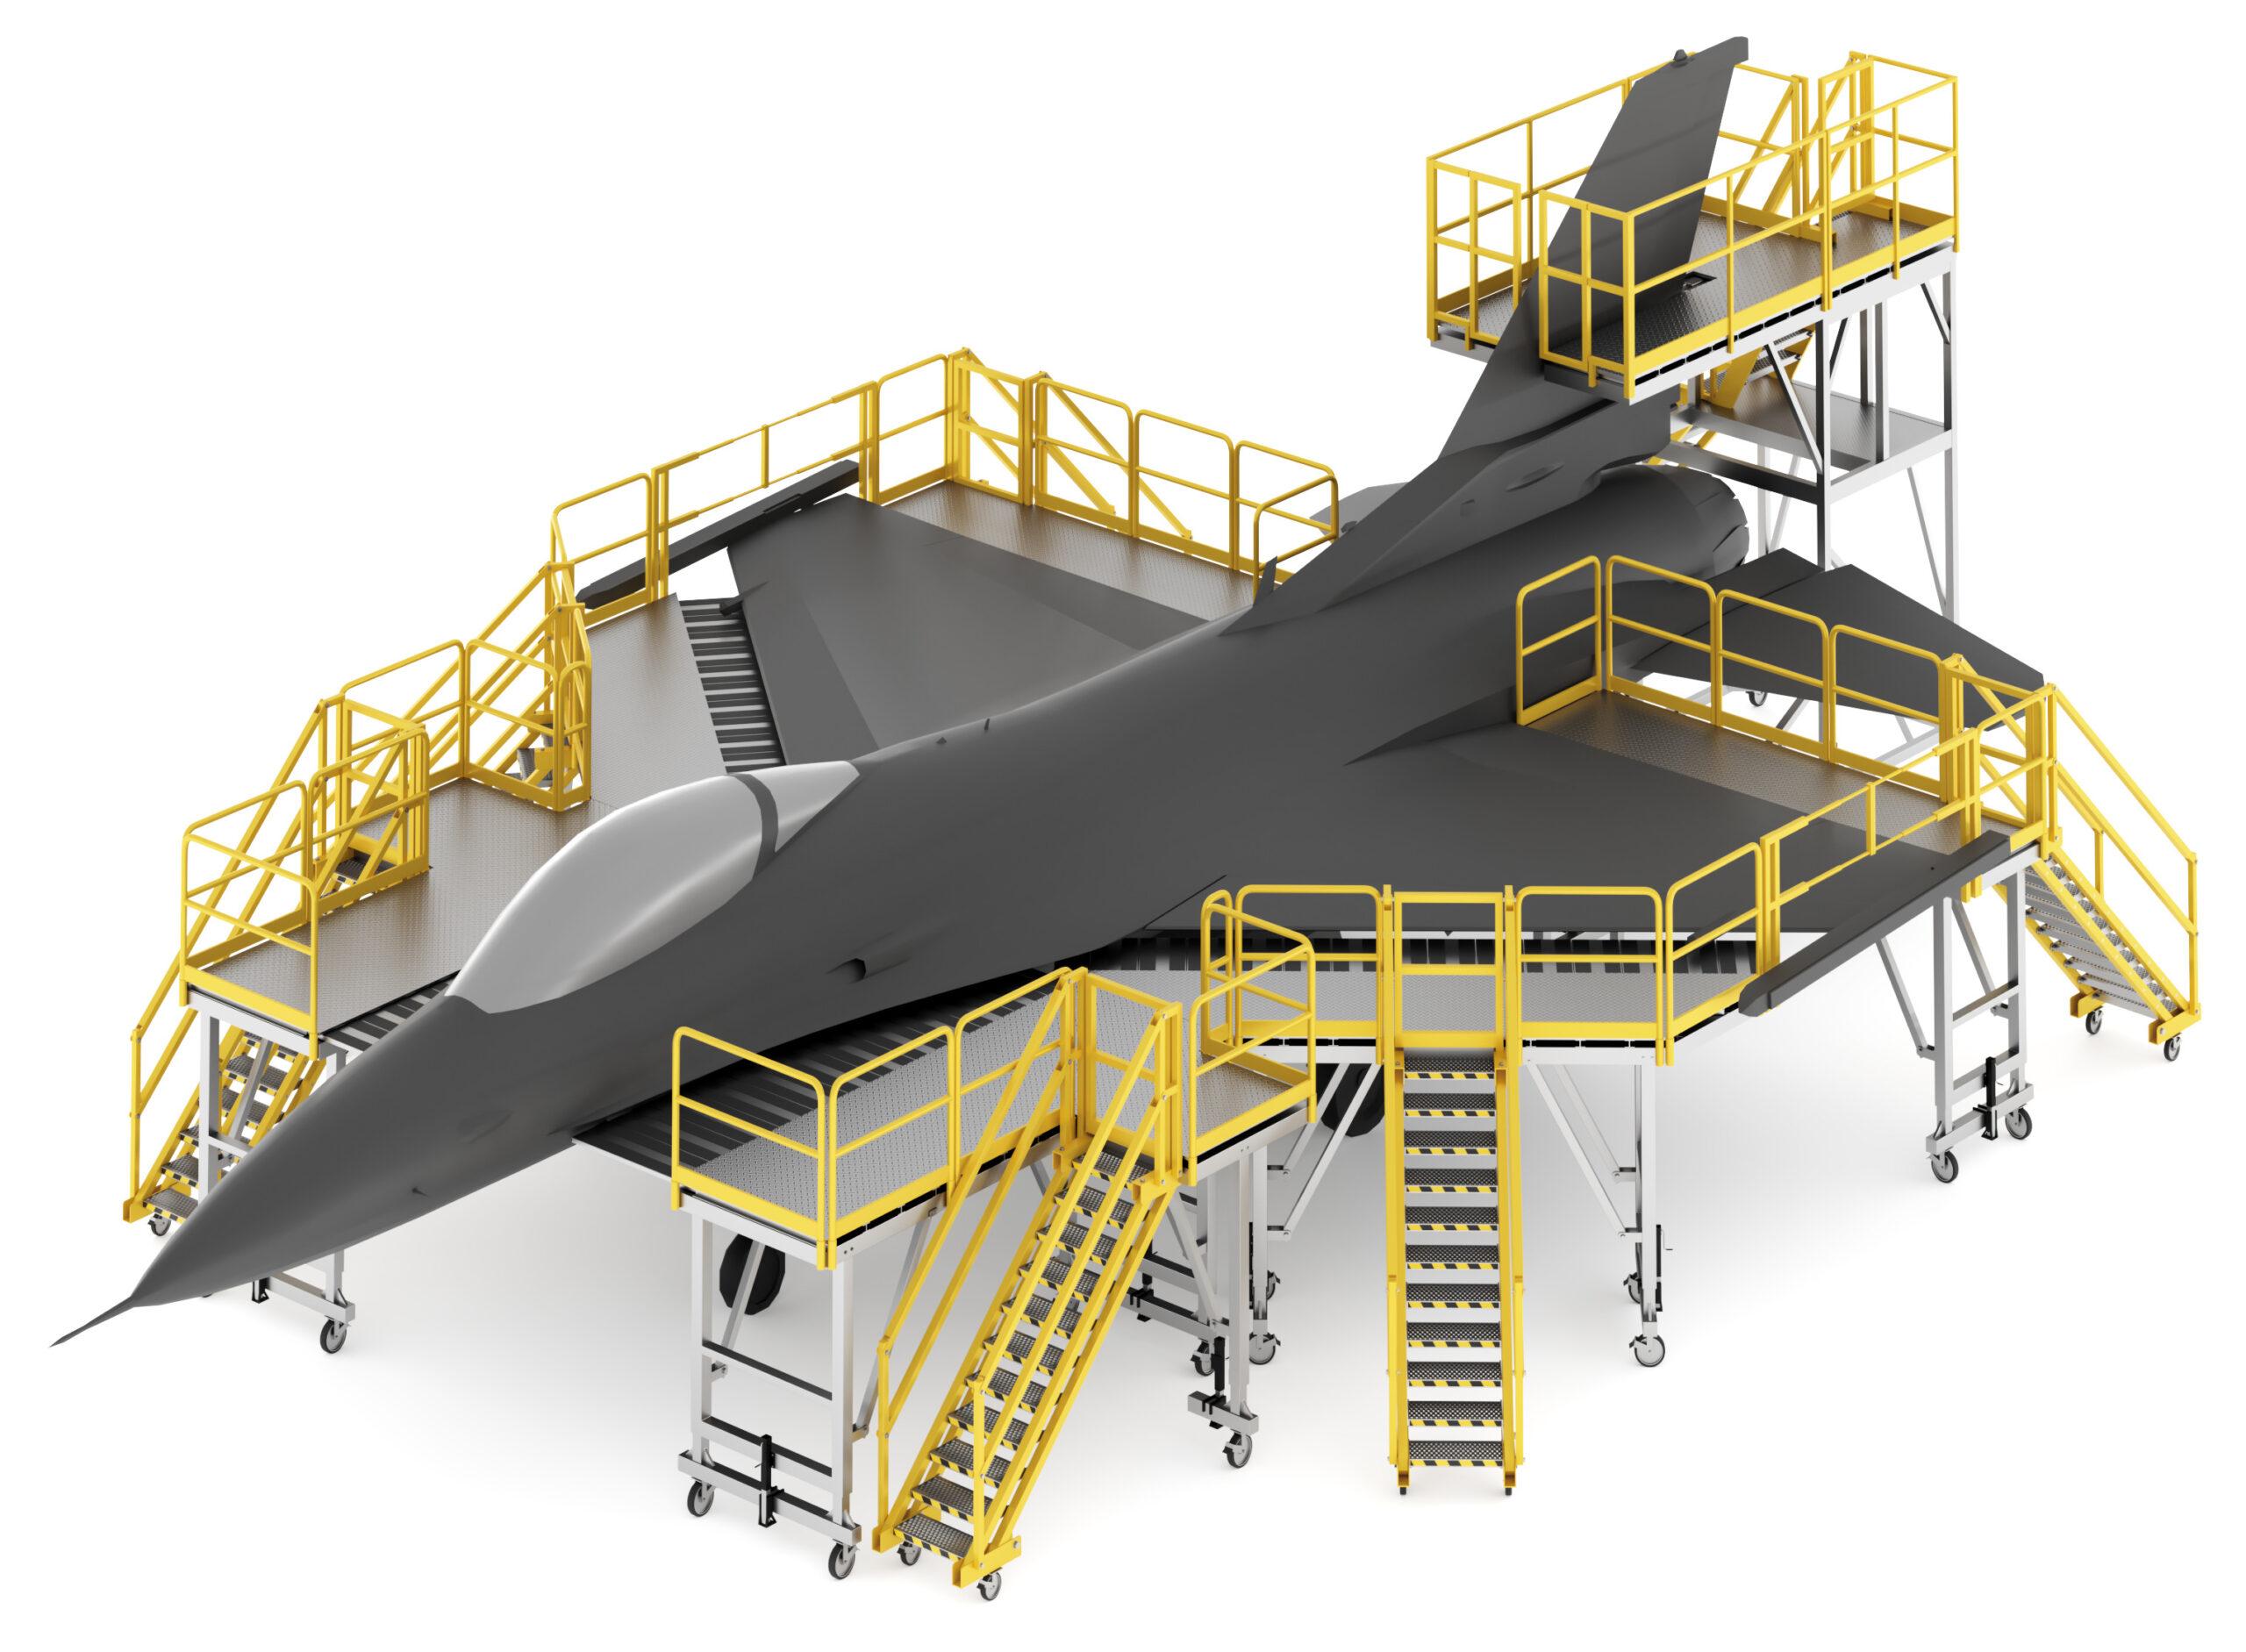 F-16 Aircraft Maintenance Stand